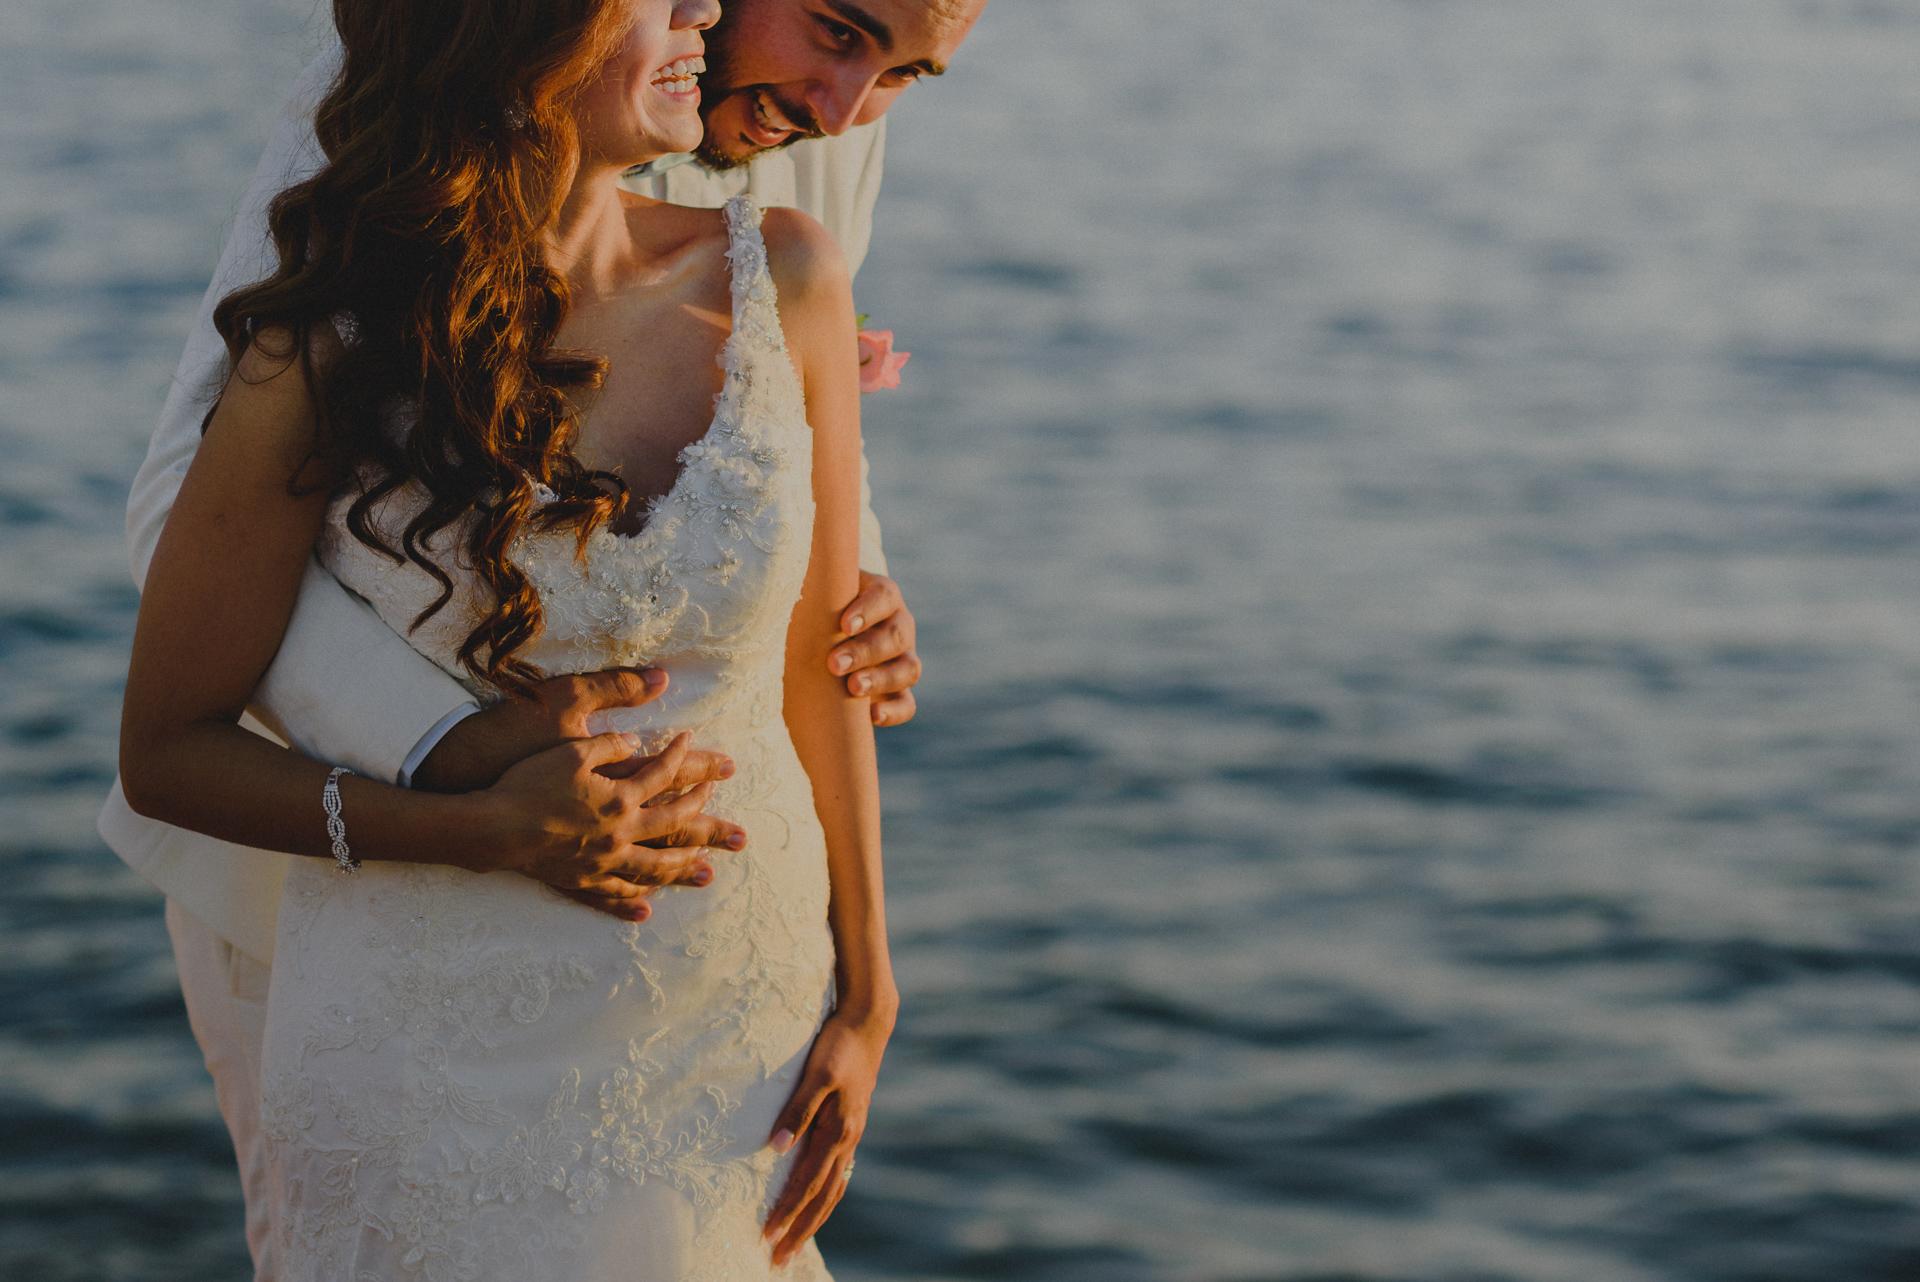 Wedding N&M BLOG luishoudin.com (92 de 174)